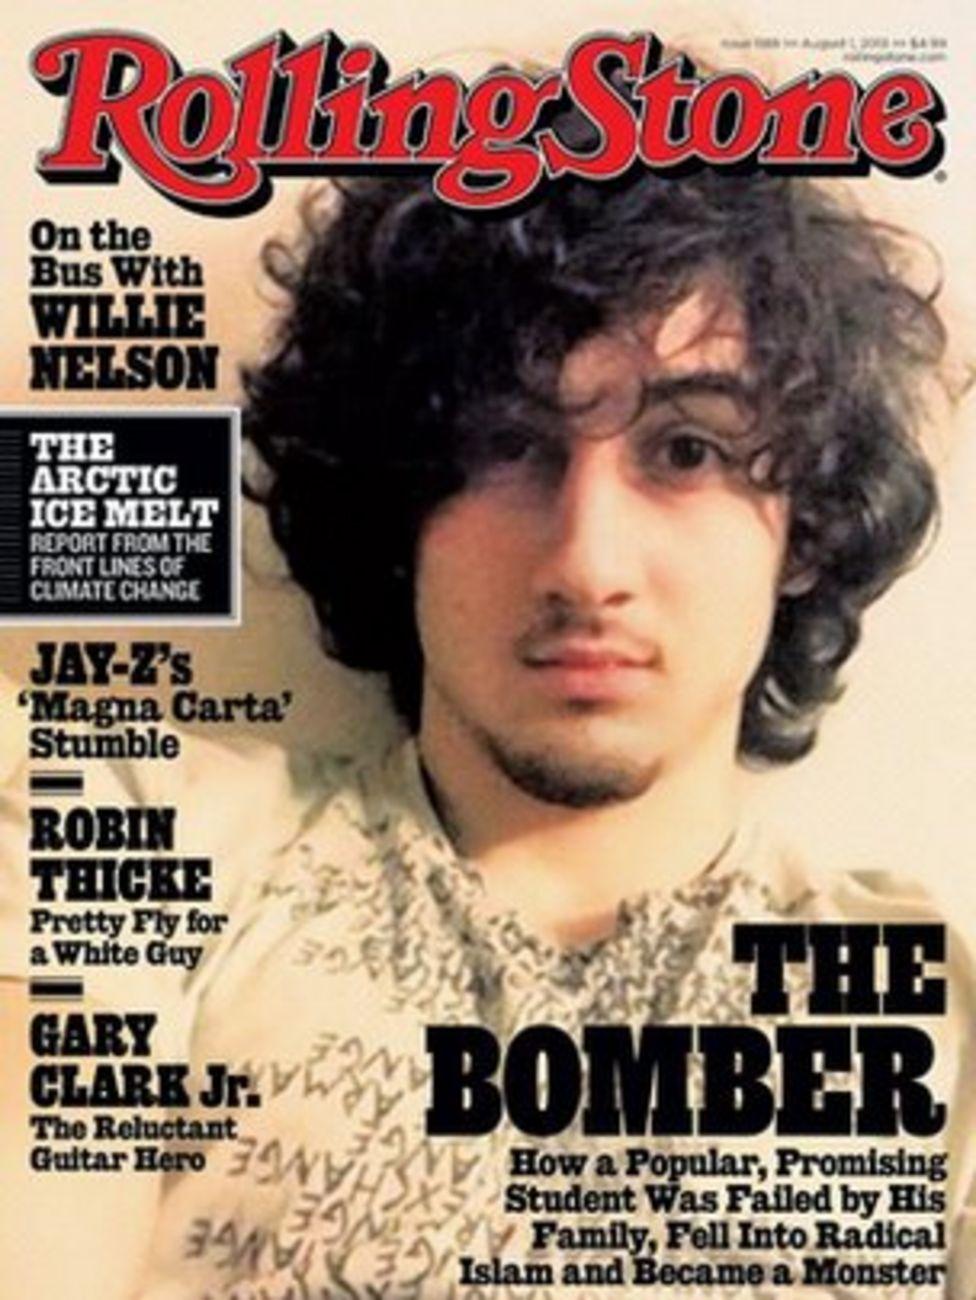 Rolling Stone magazine cover from August 2013, featuring Boston Marathon Bomber Dzhokhar Tsarnaev.